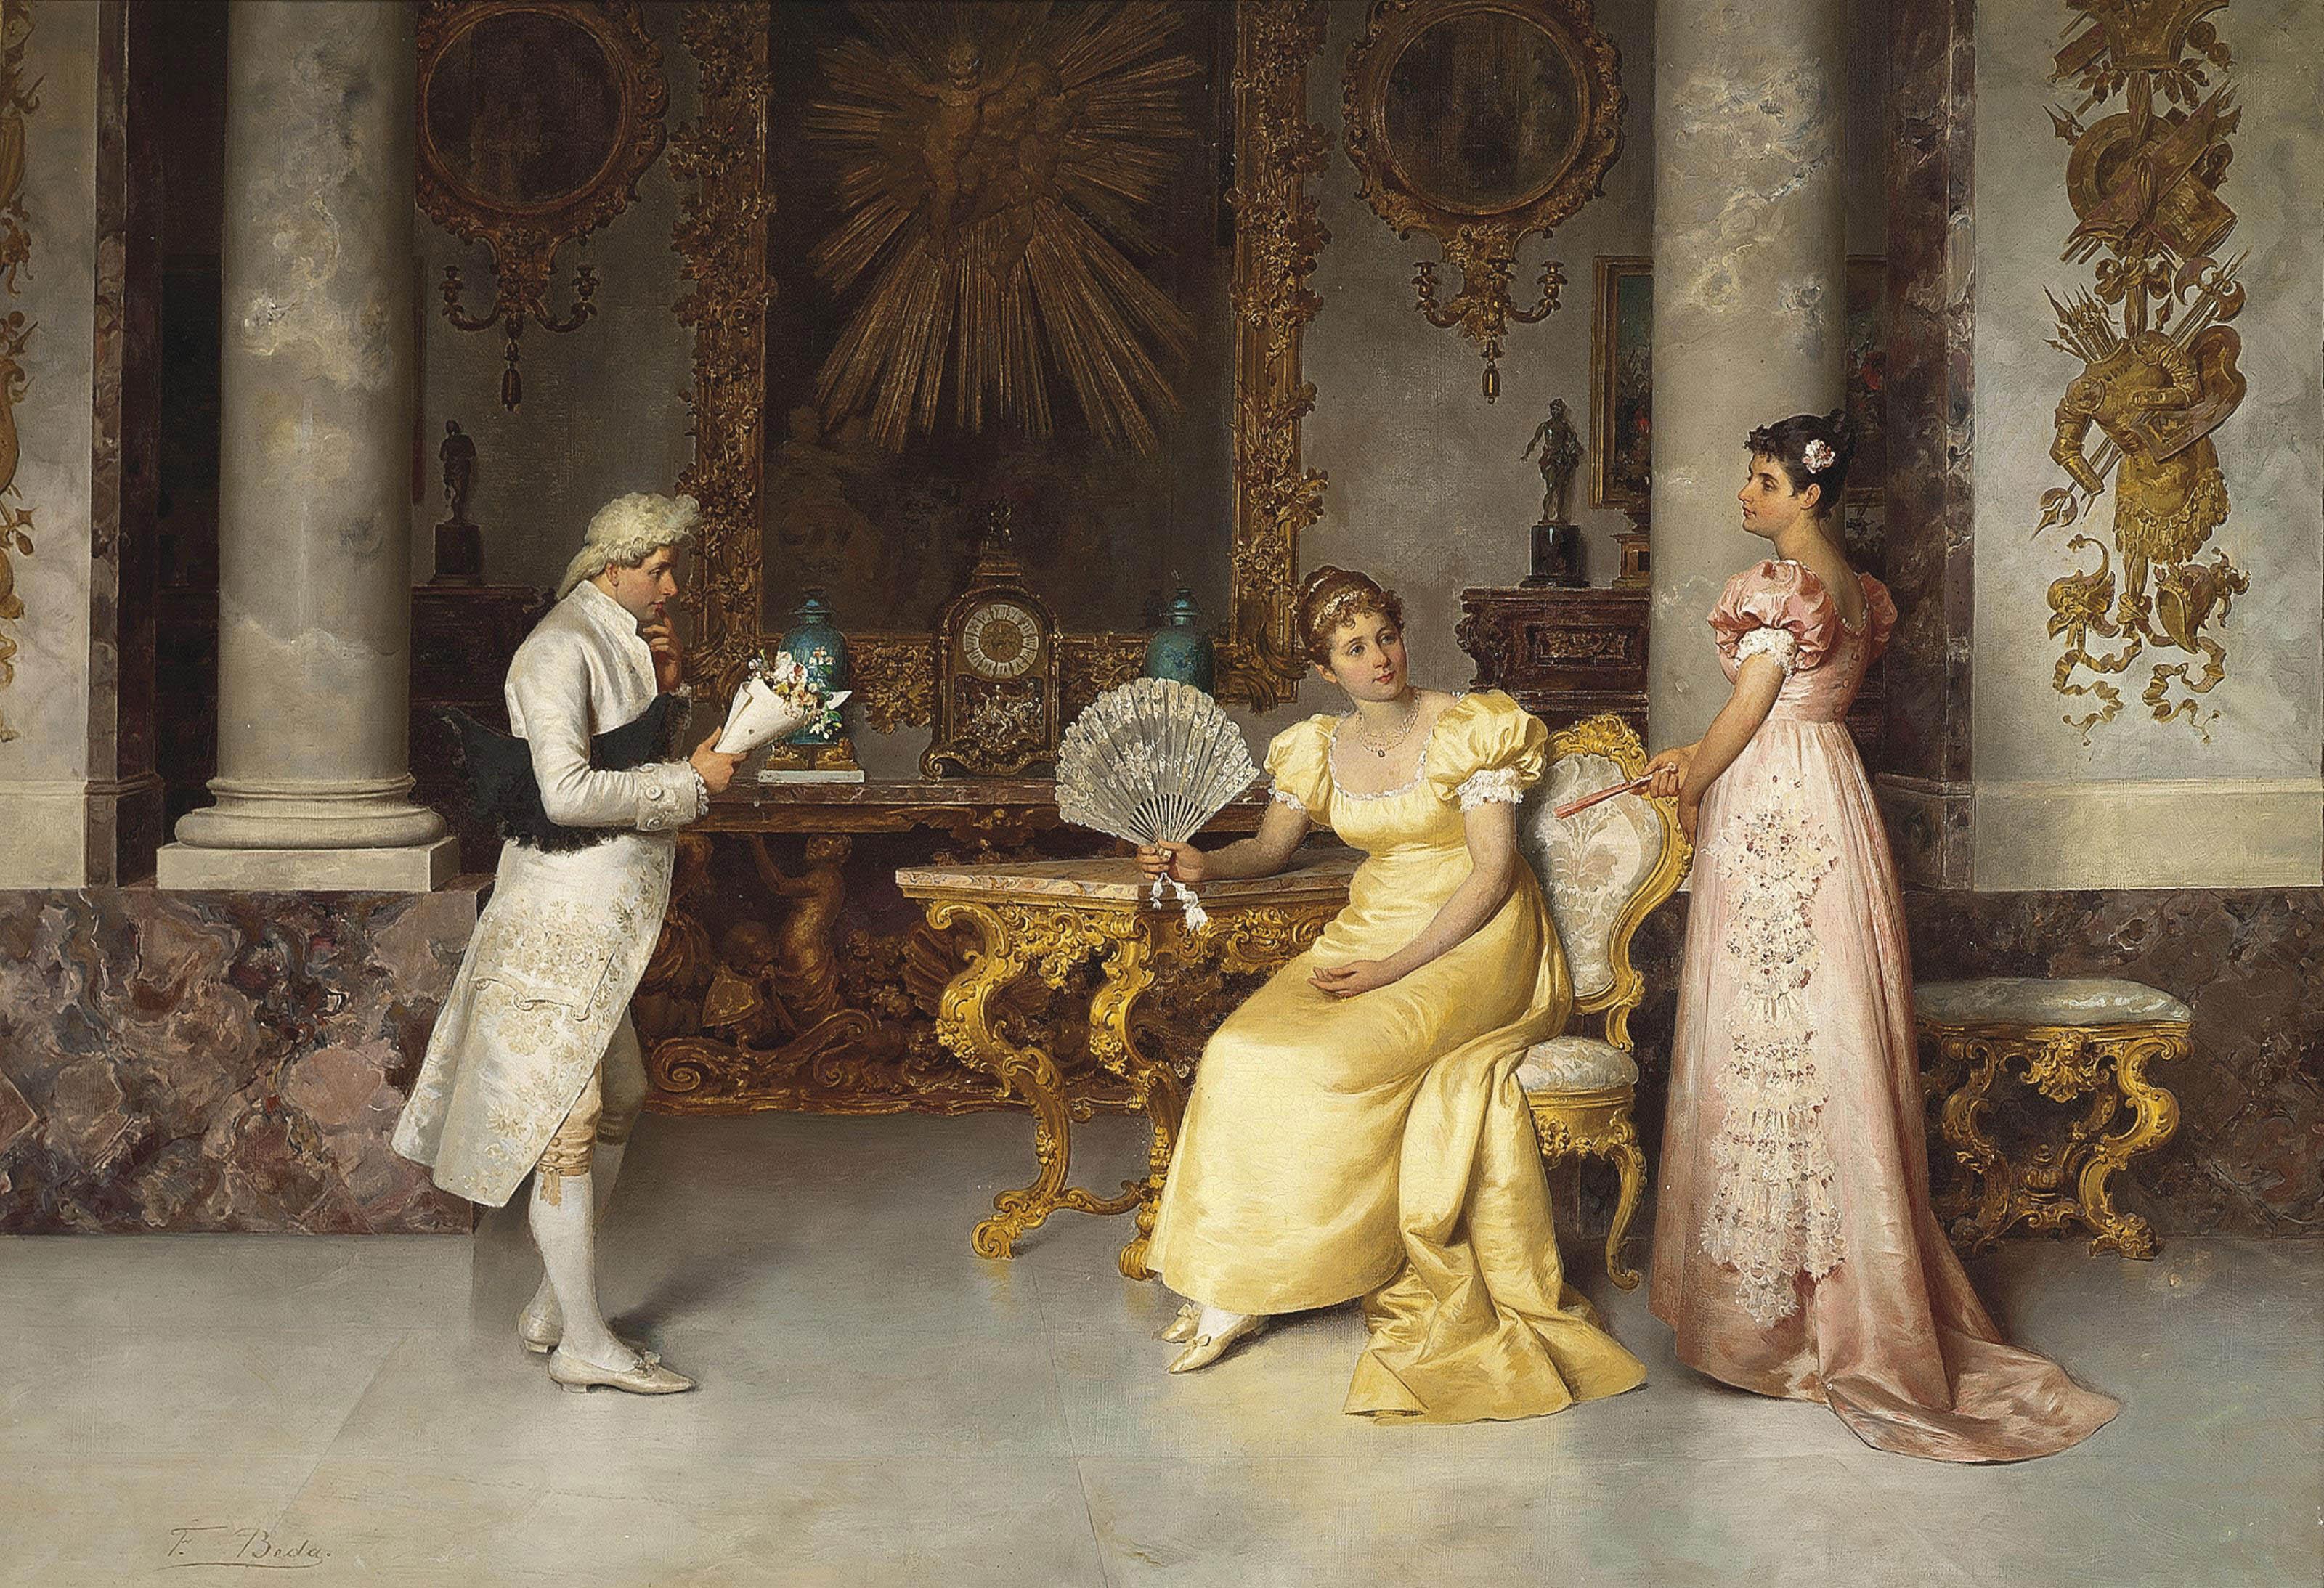 Francesco Beda (Italian, 1840-1900)